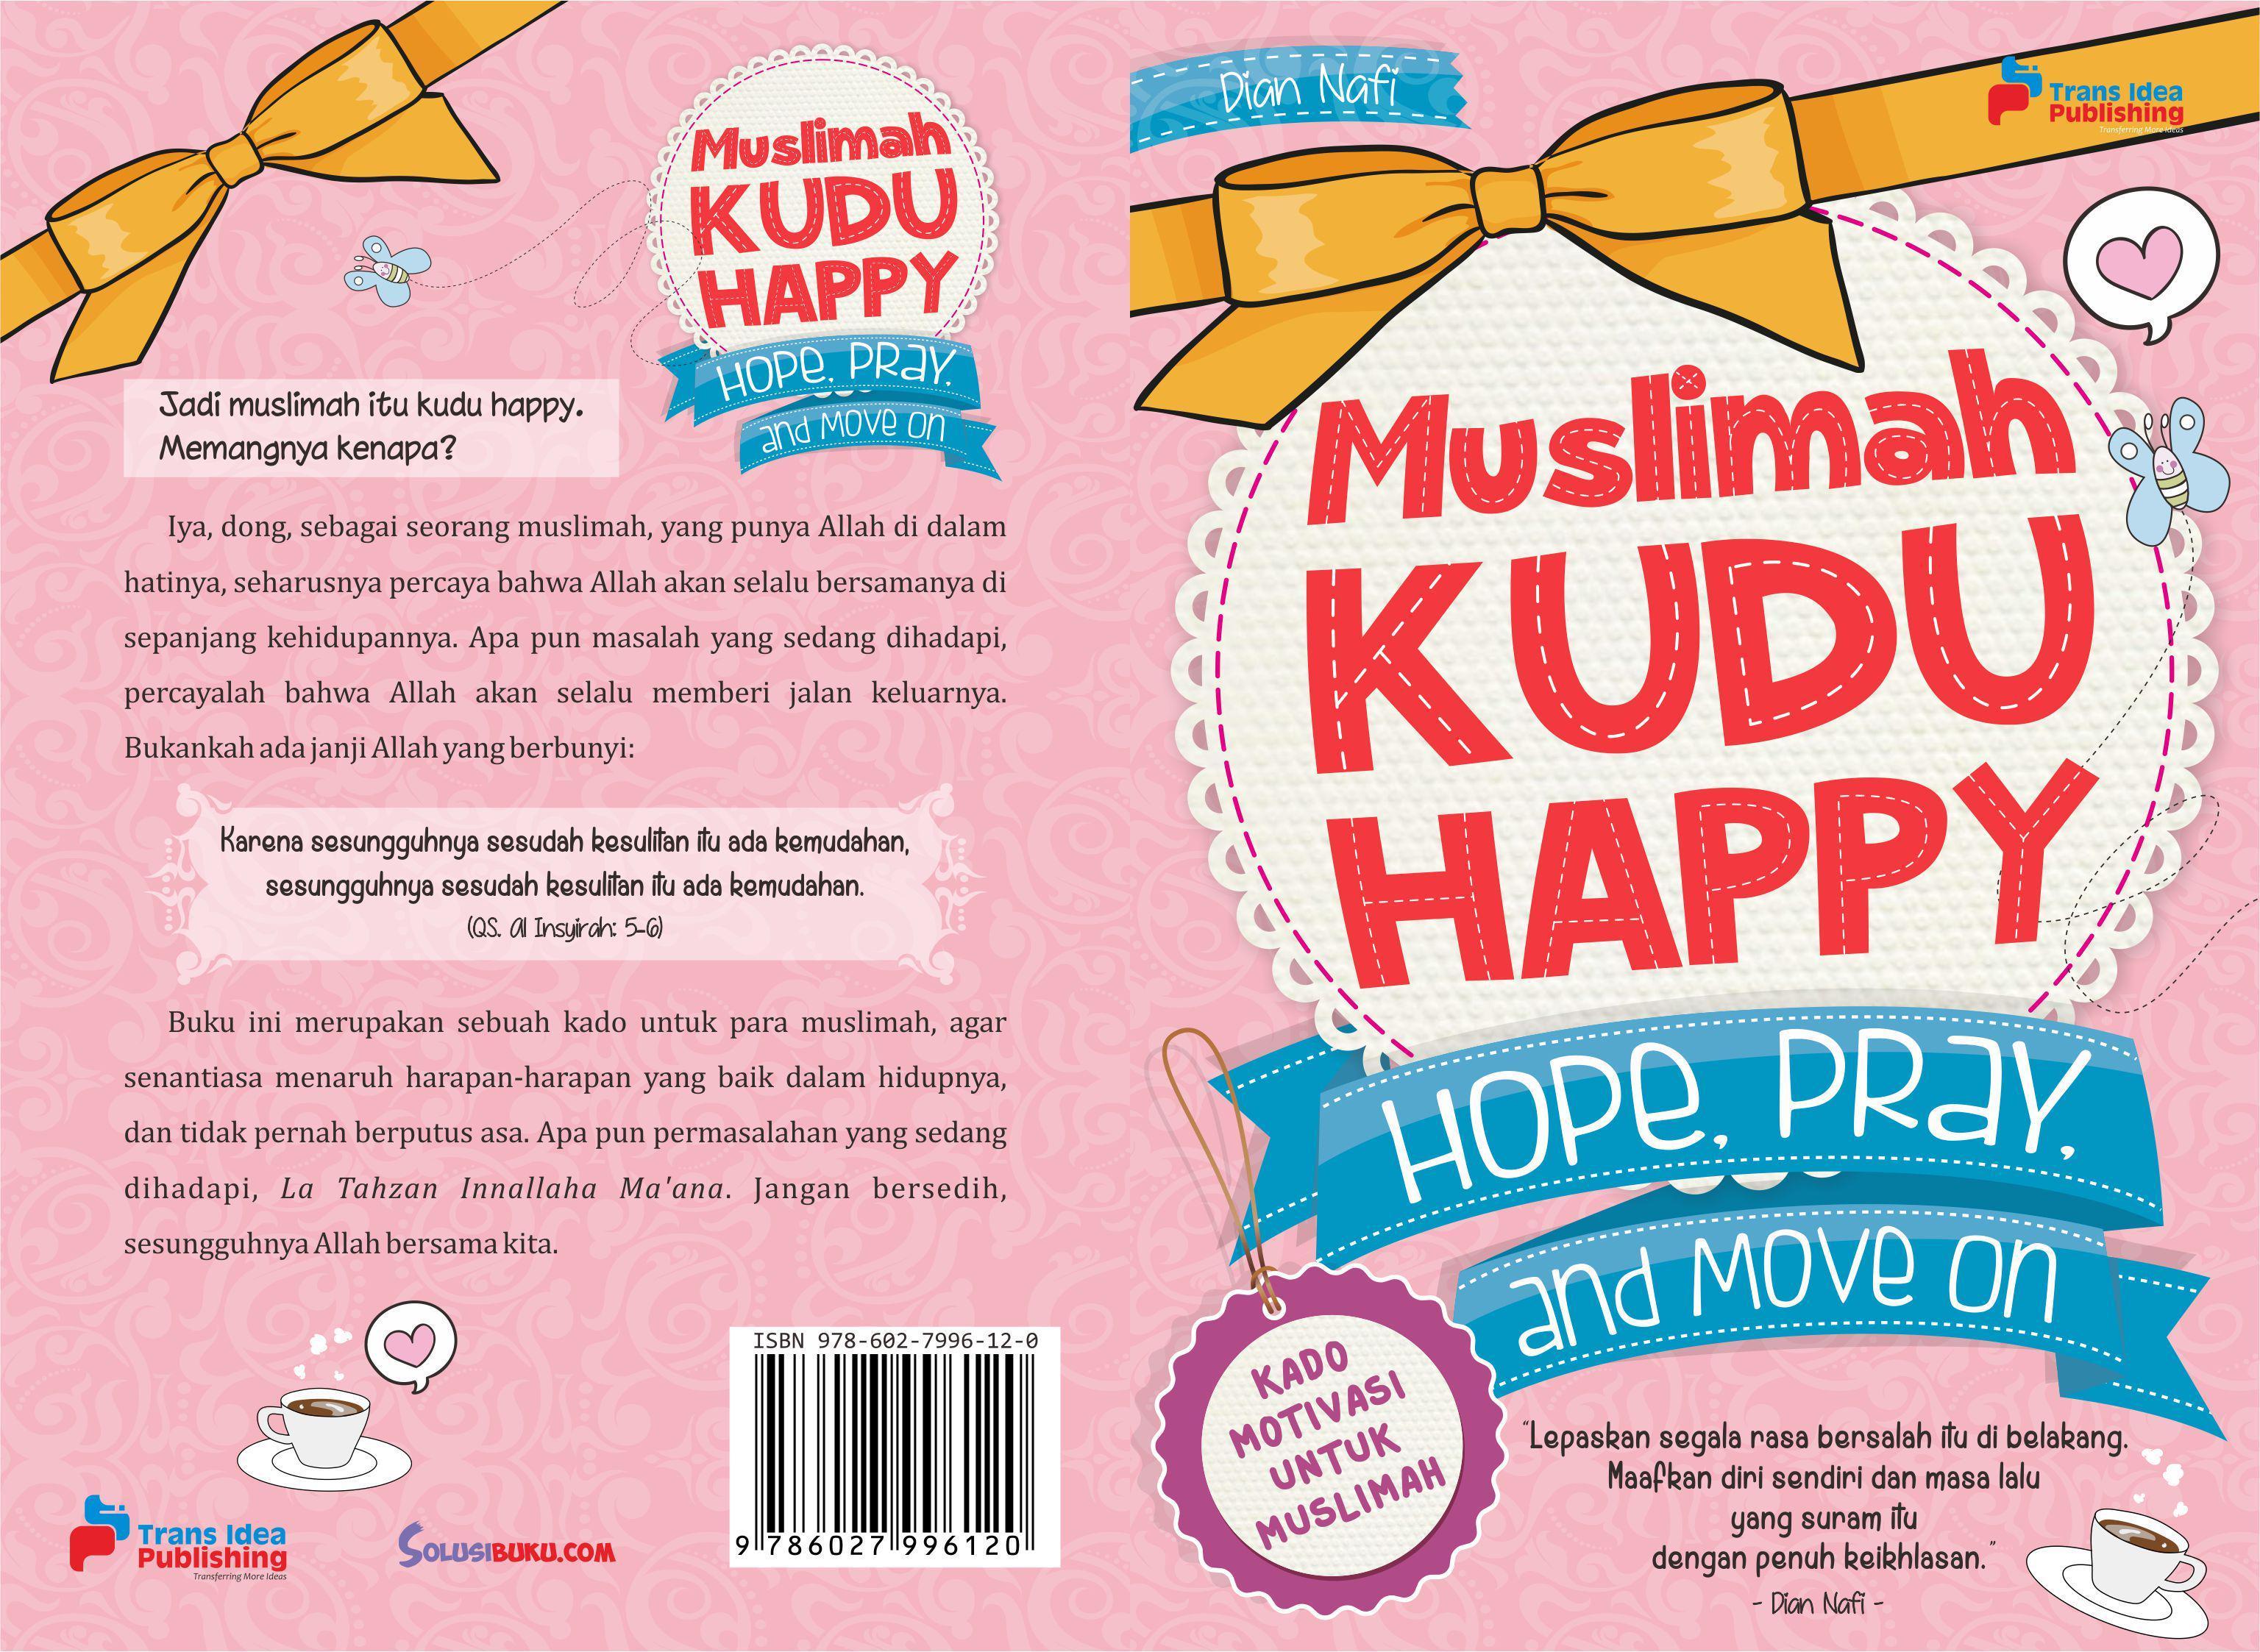 Muslimah Kudu Happy